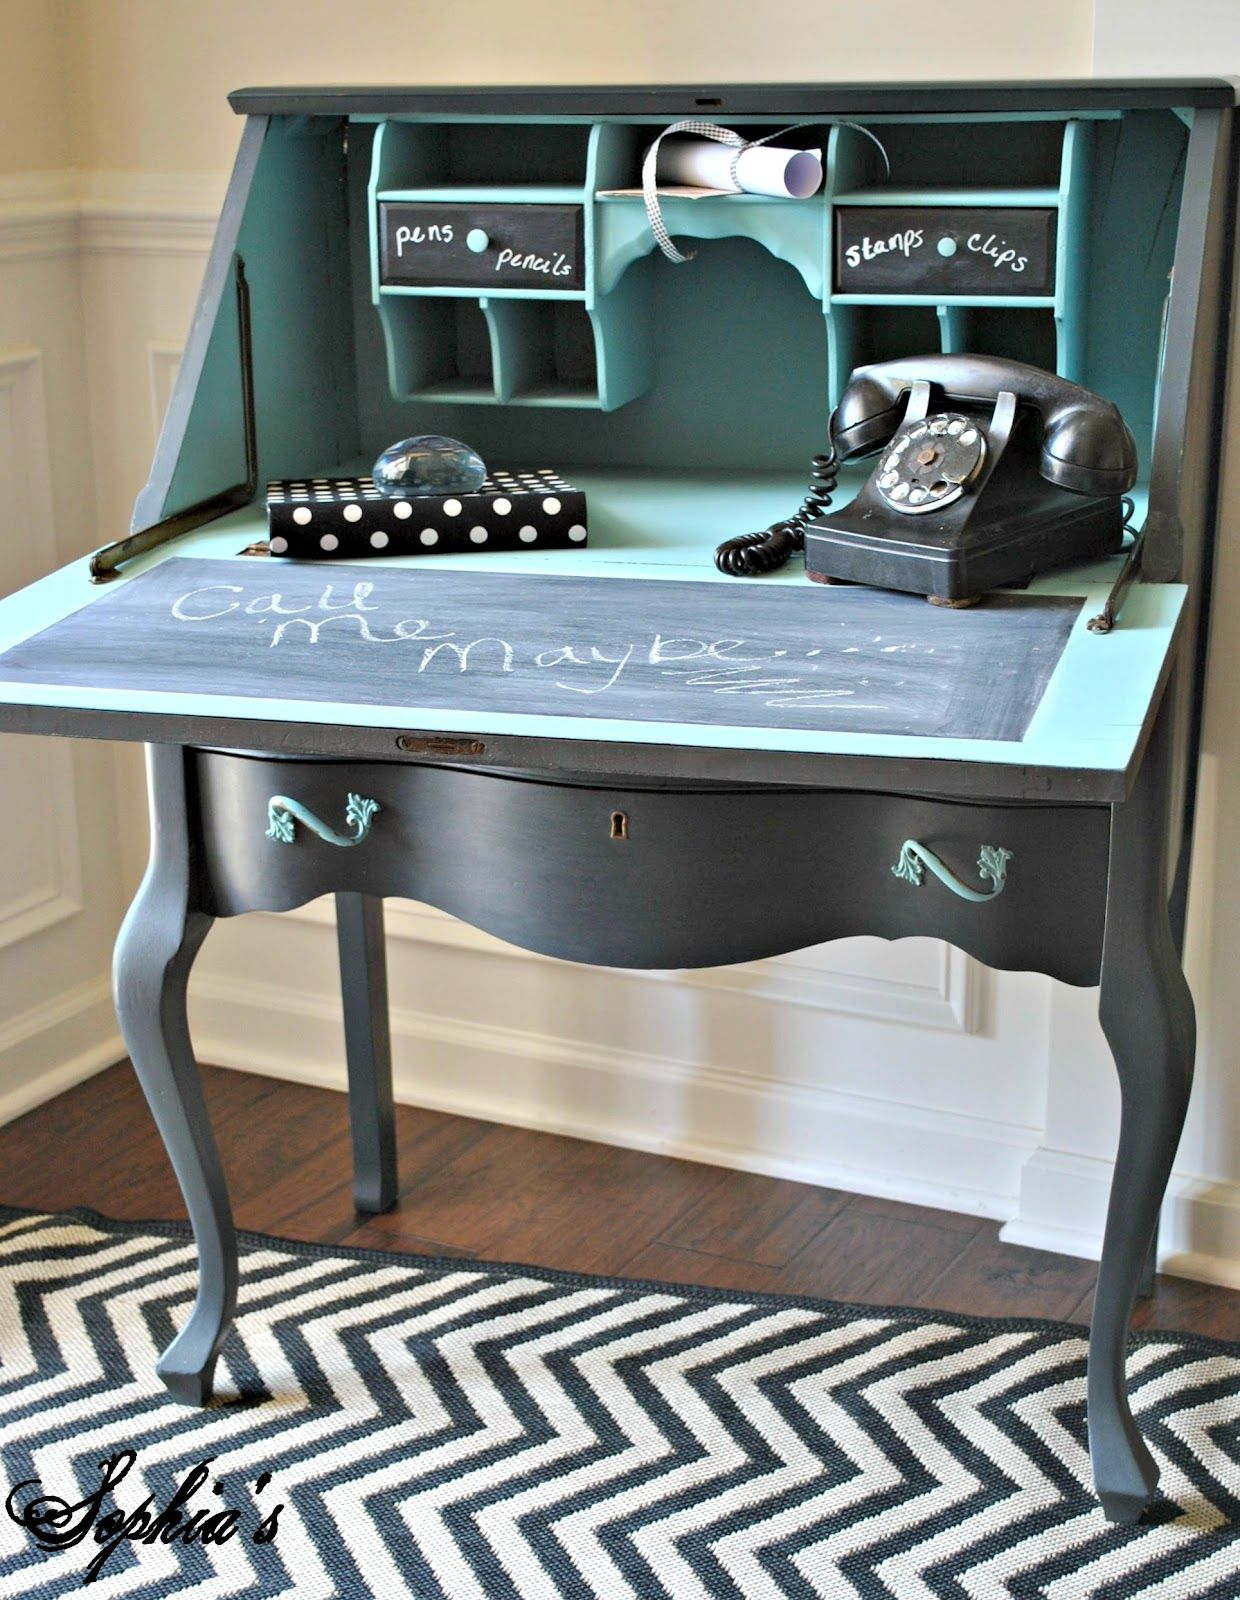 image desks products blue l dziecka description en desk product regulowane biurko chairs fundesk krzeselko dla cantare